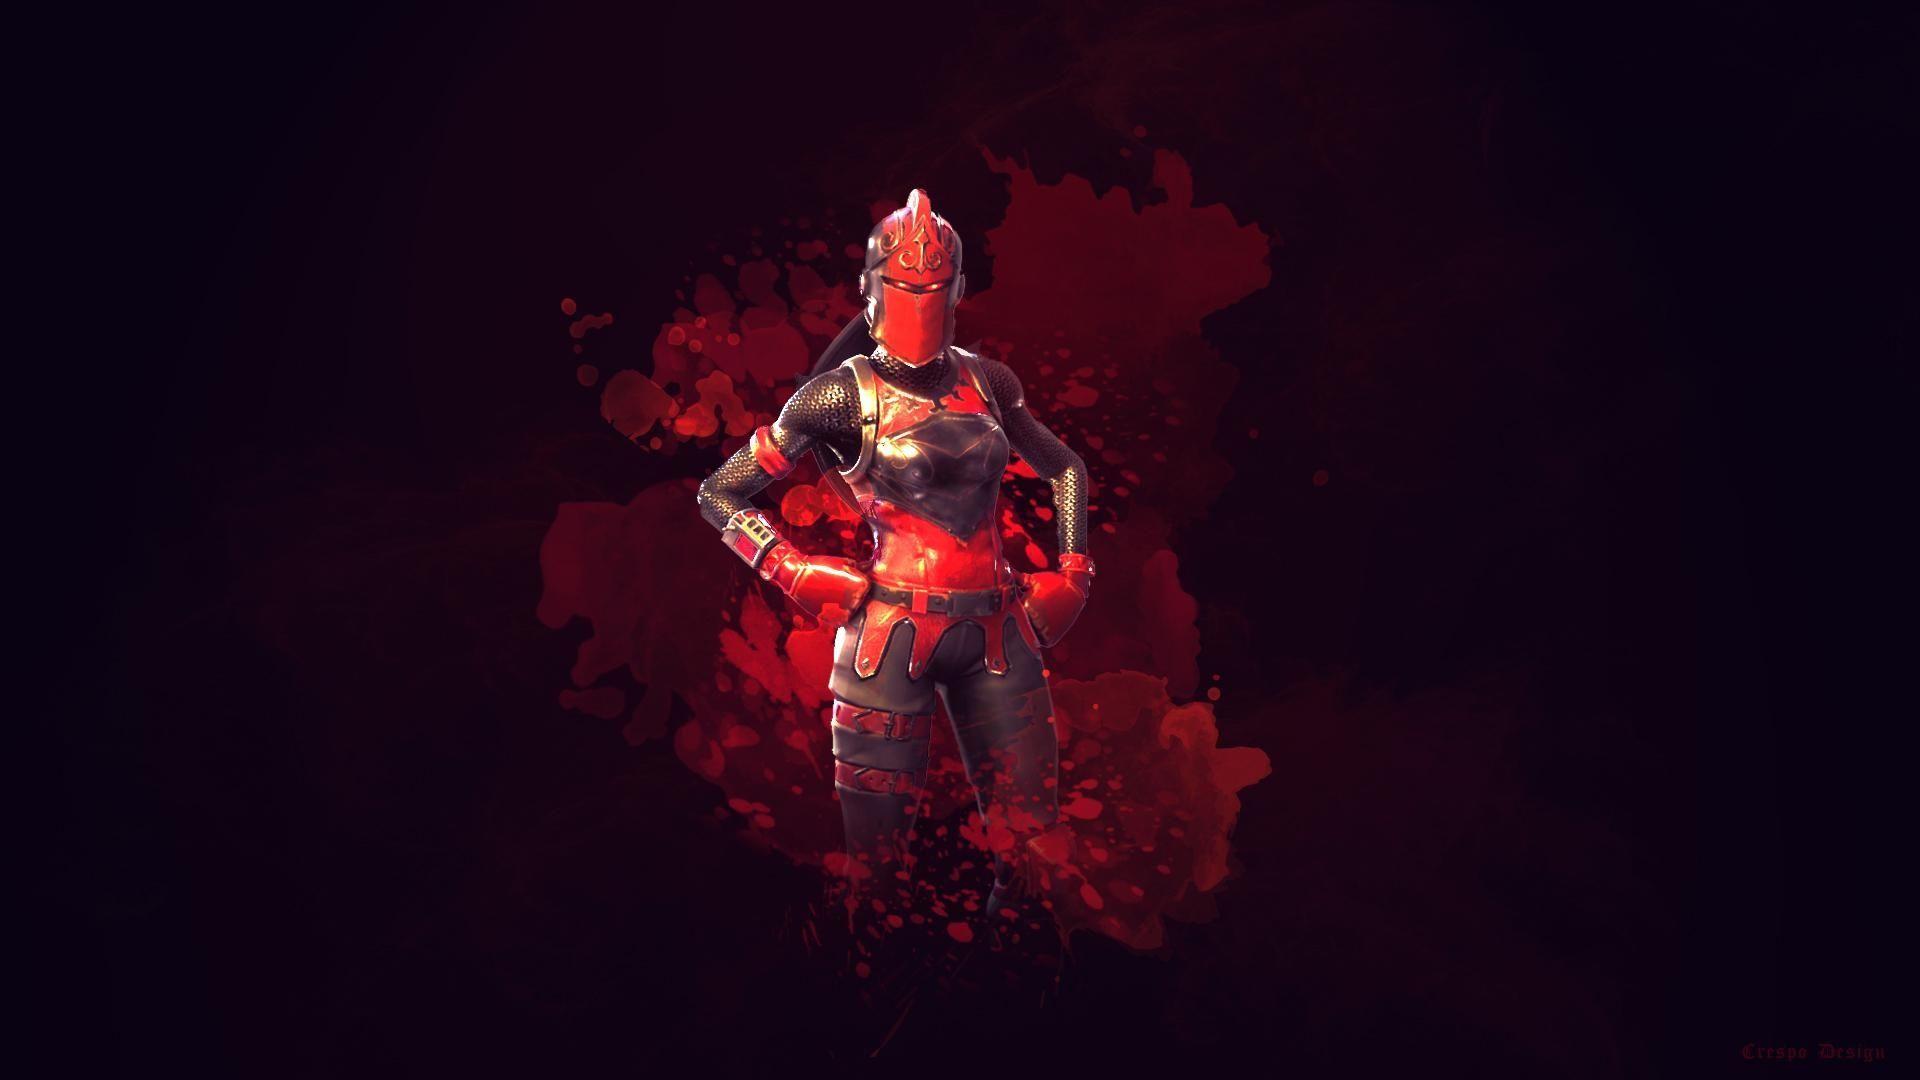 Red Fortnite Skins Wallpapers Wallpaper Cave